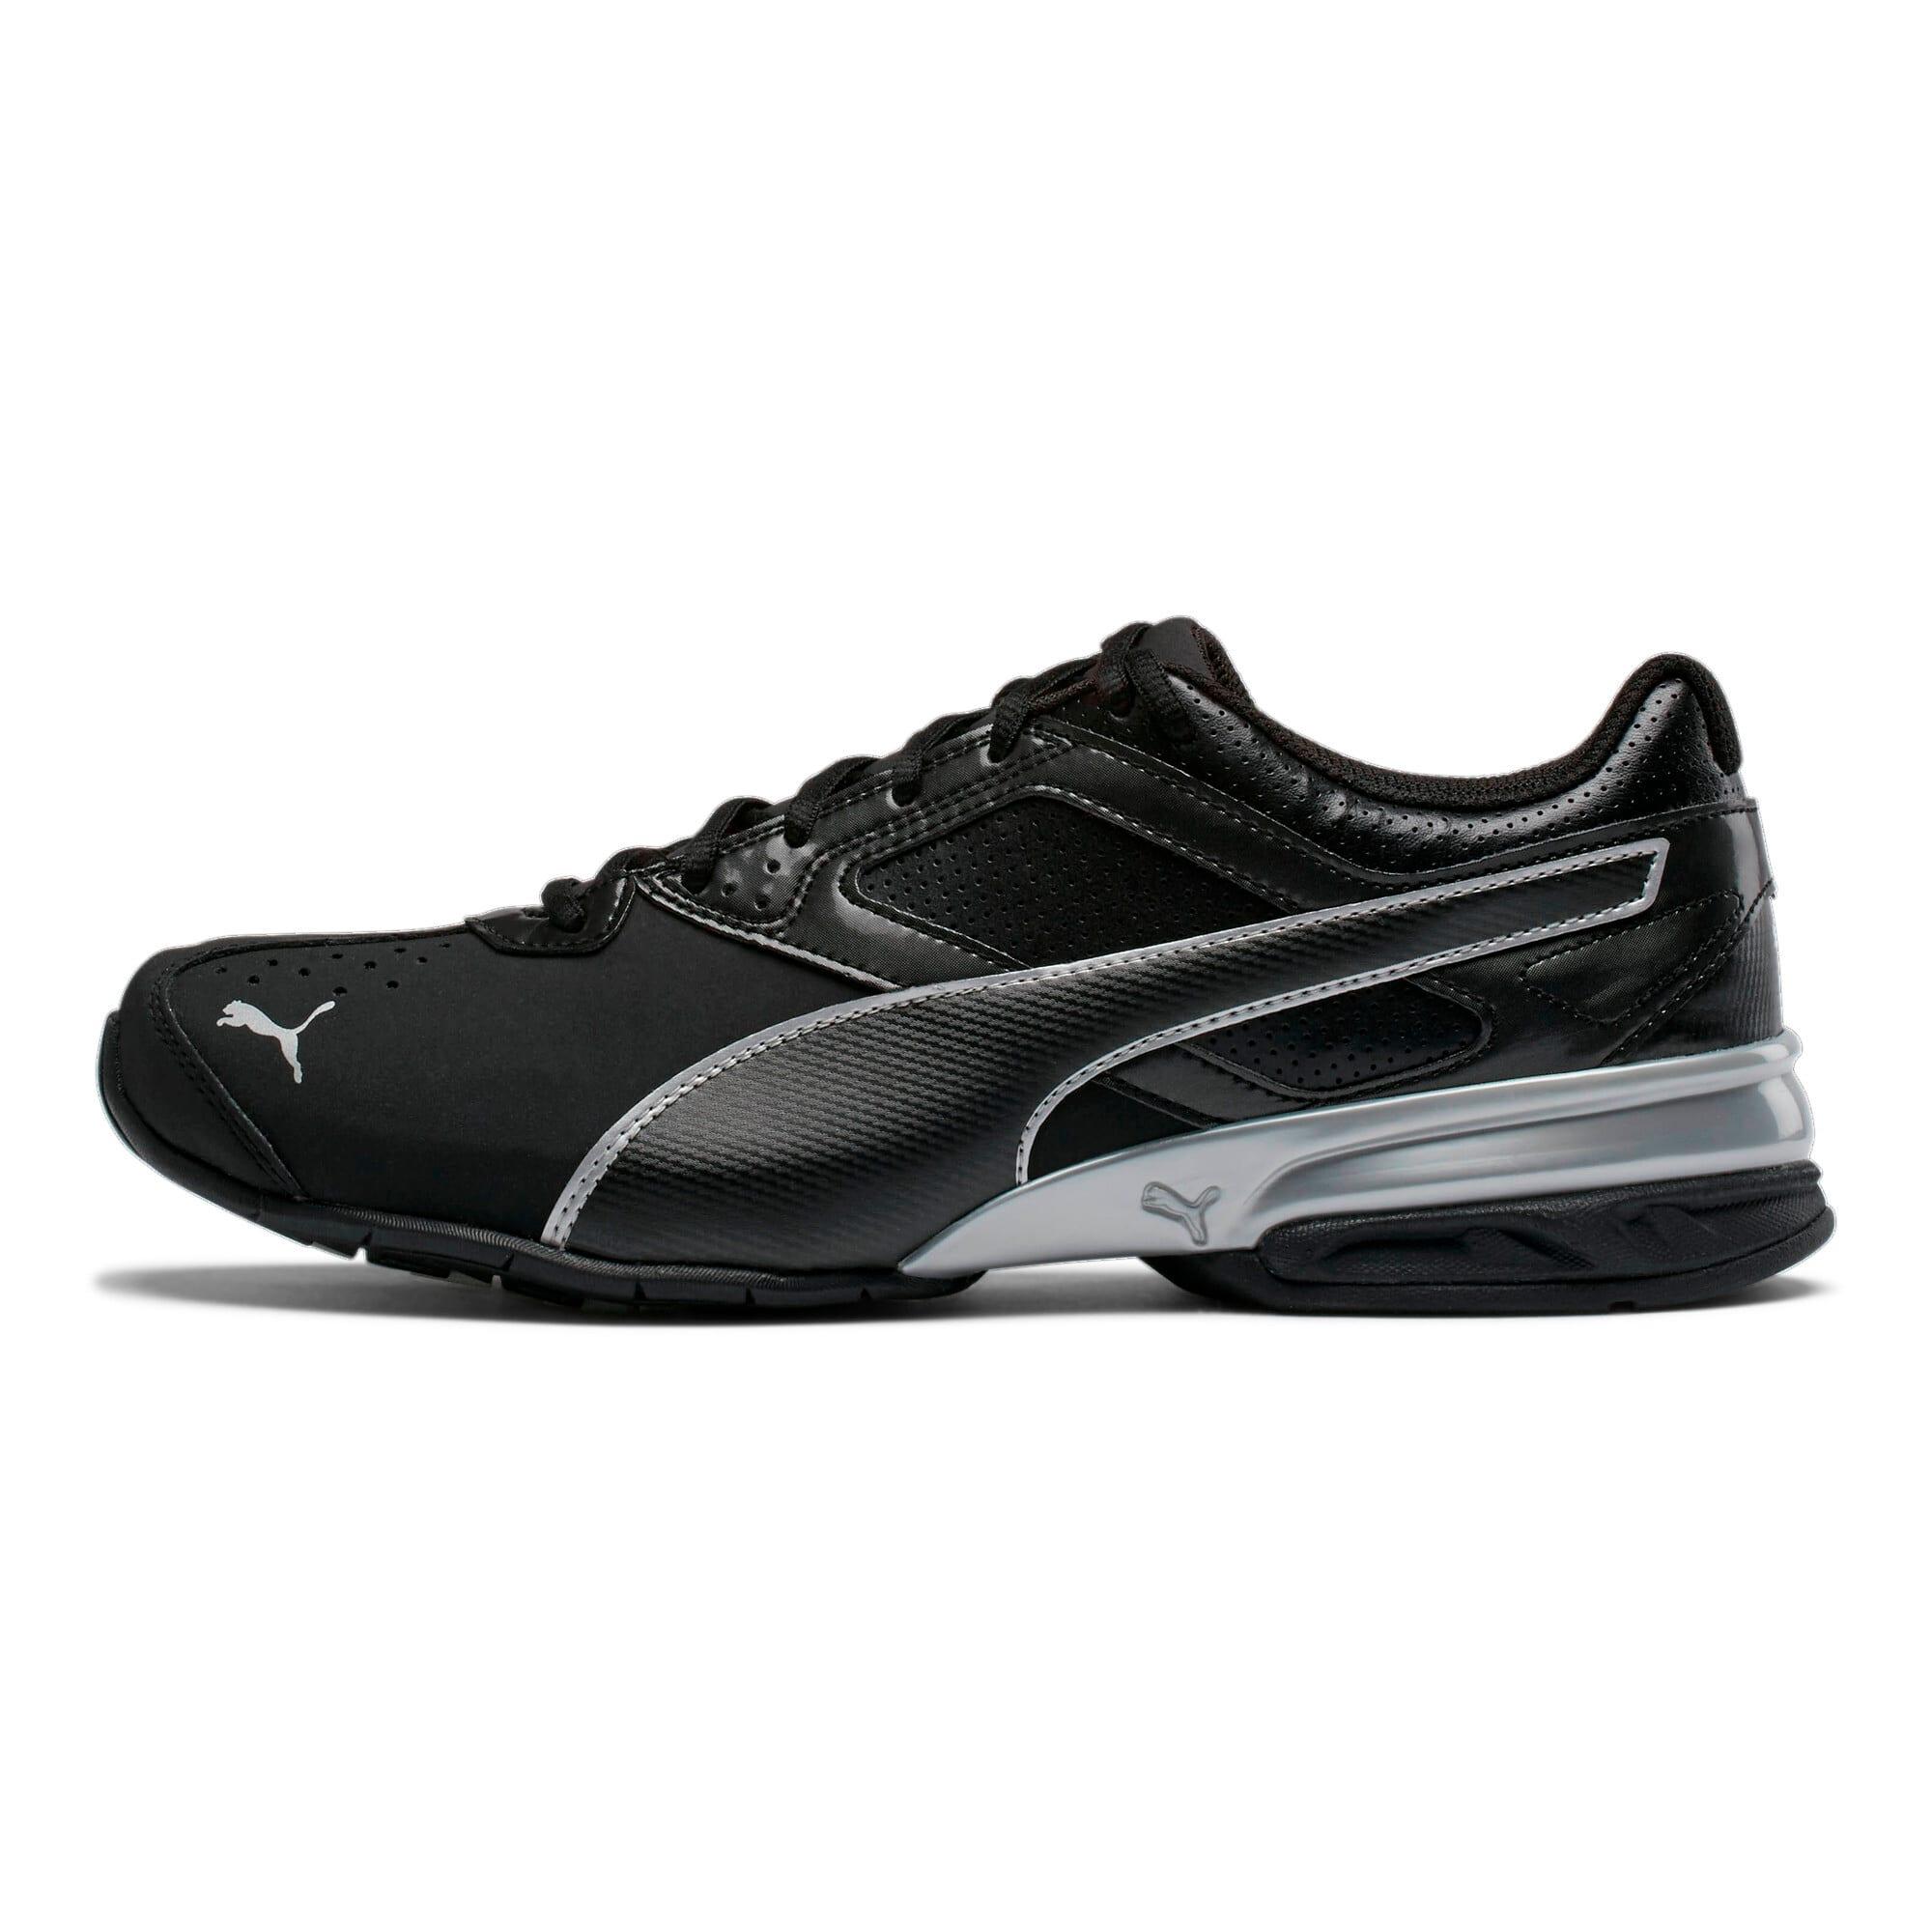 Thumbnail 1 of Tazon 6 FM Men's Sneakers, Puma Black-puma silver, medium